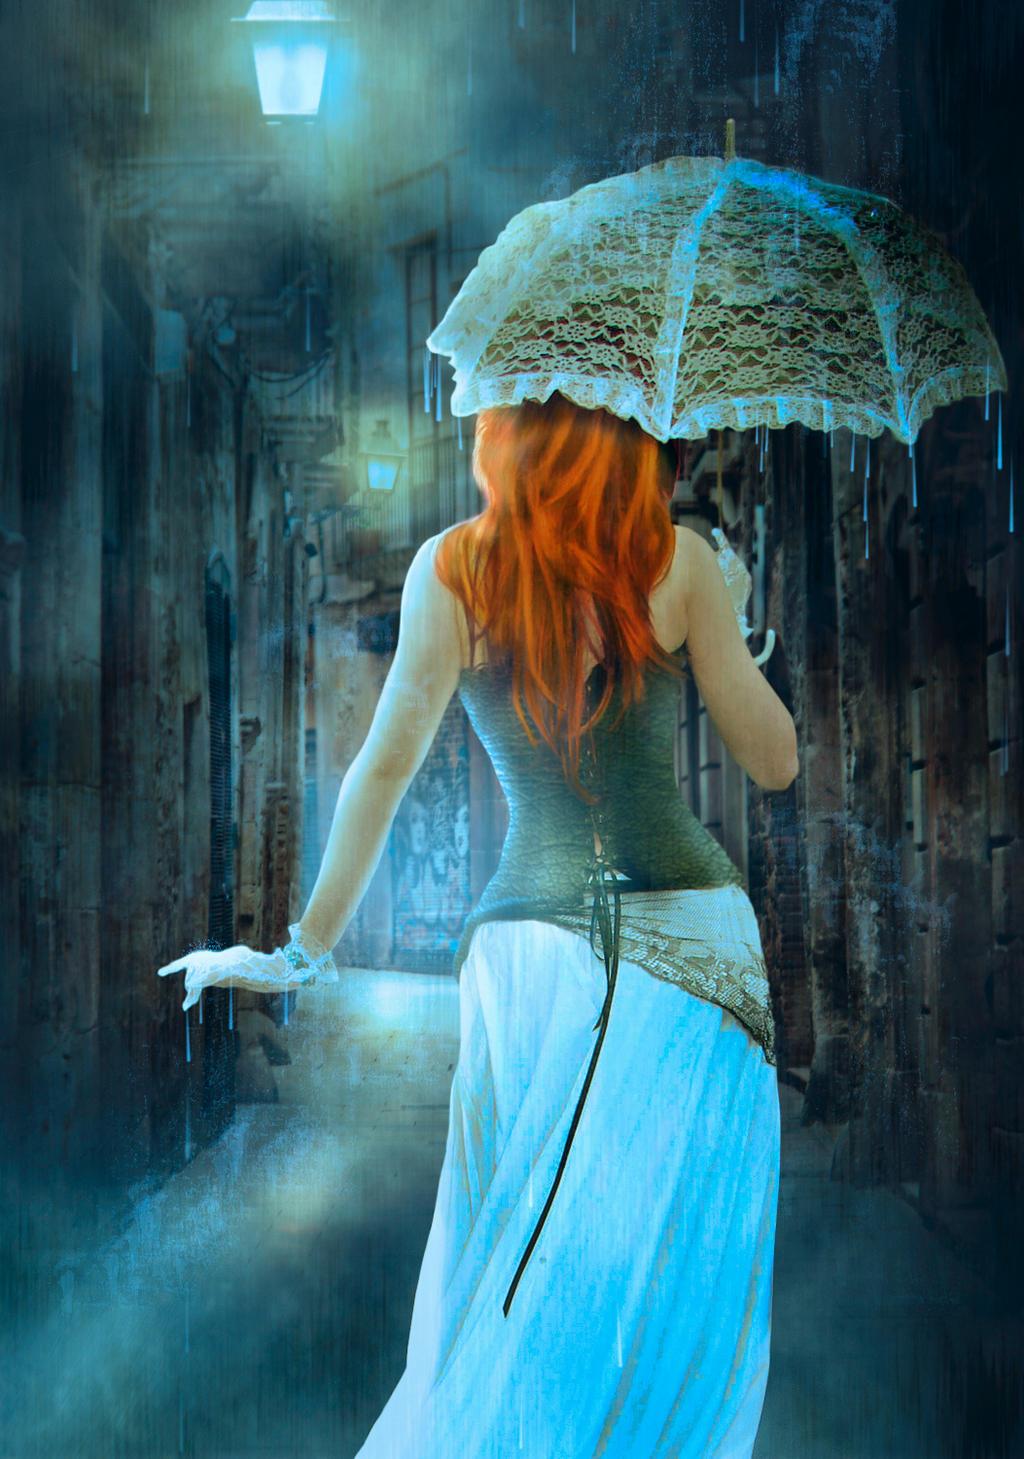 RainyNight by VertigoEBC